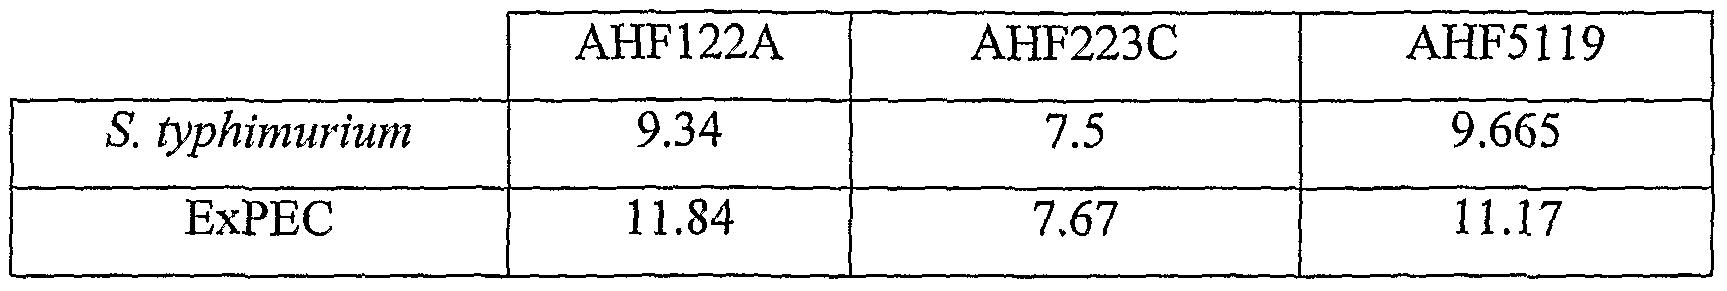 WO2006130187A1 - Feline probiotic lactobacilli - Google Patents